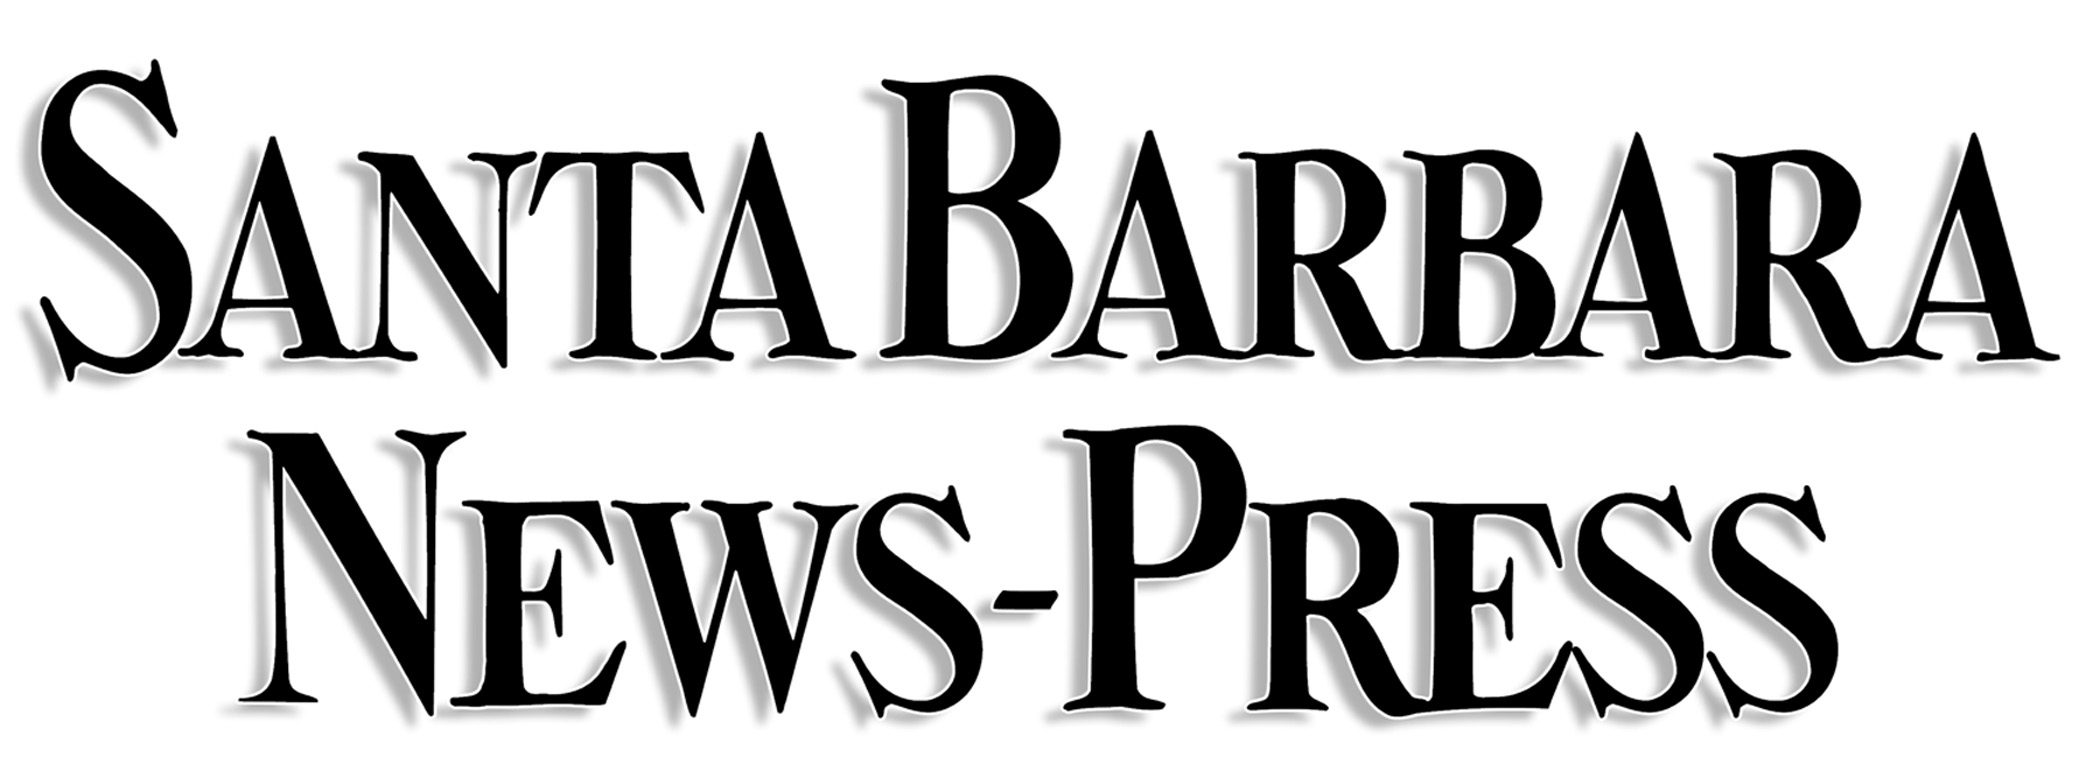 Santa-Barbara-News-Press.jpg